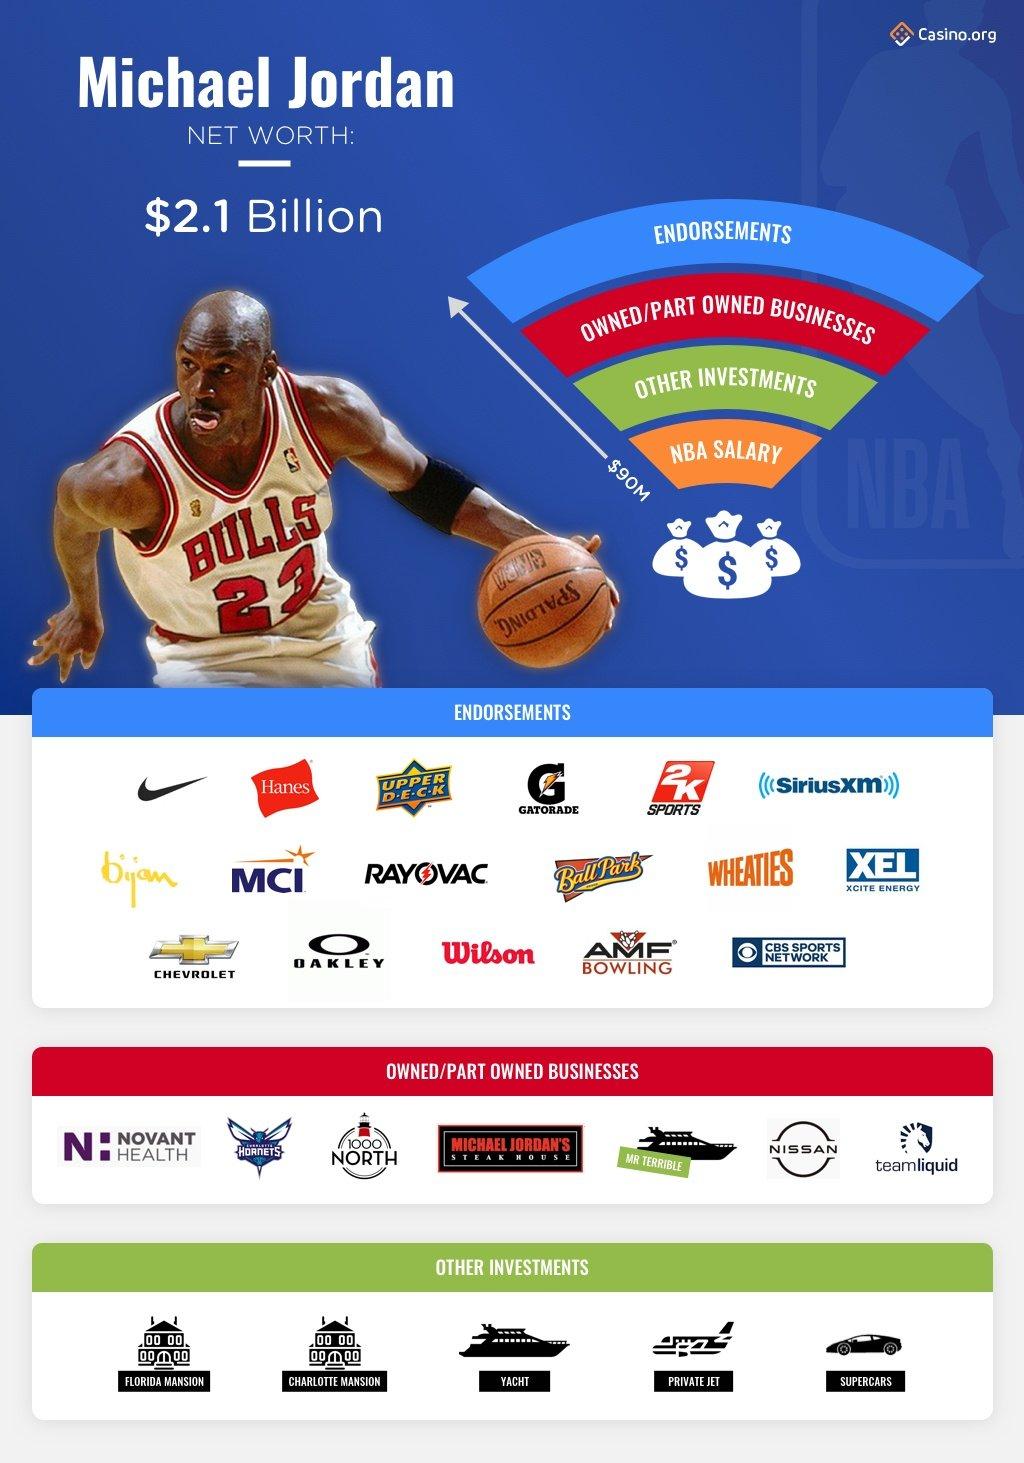 Michael Jordan infographic